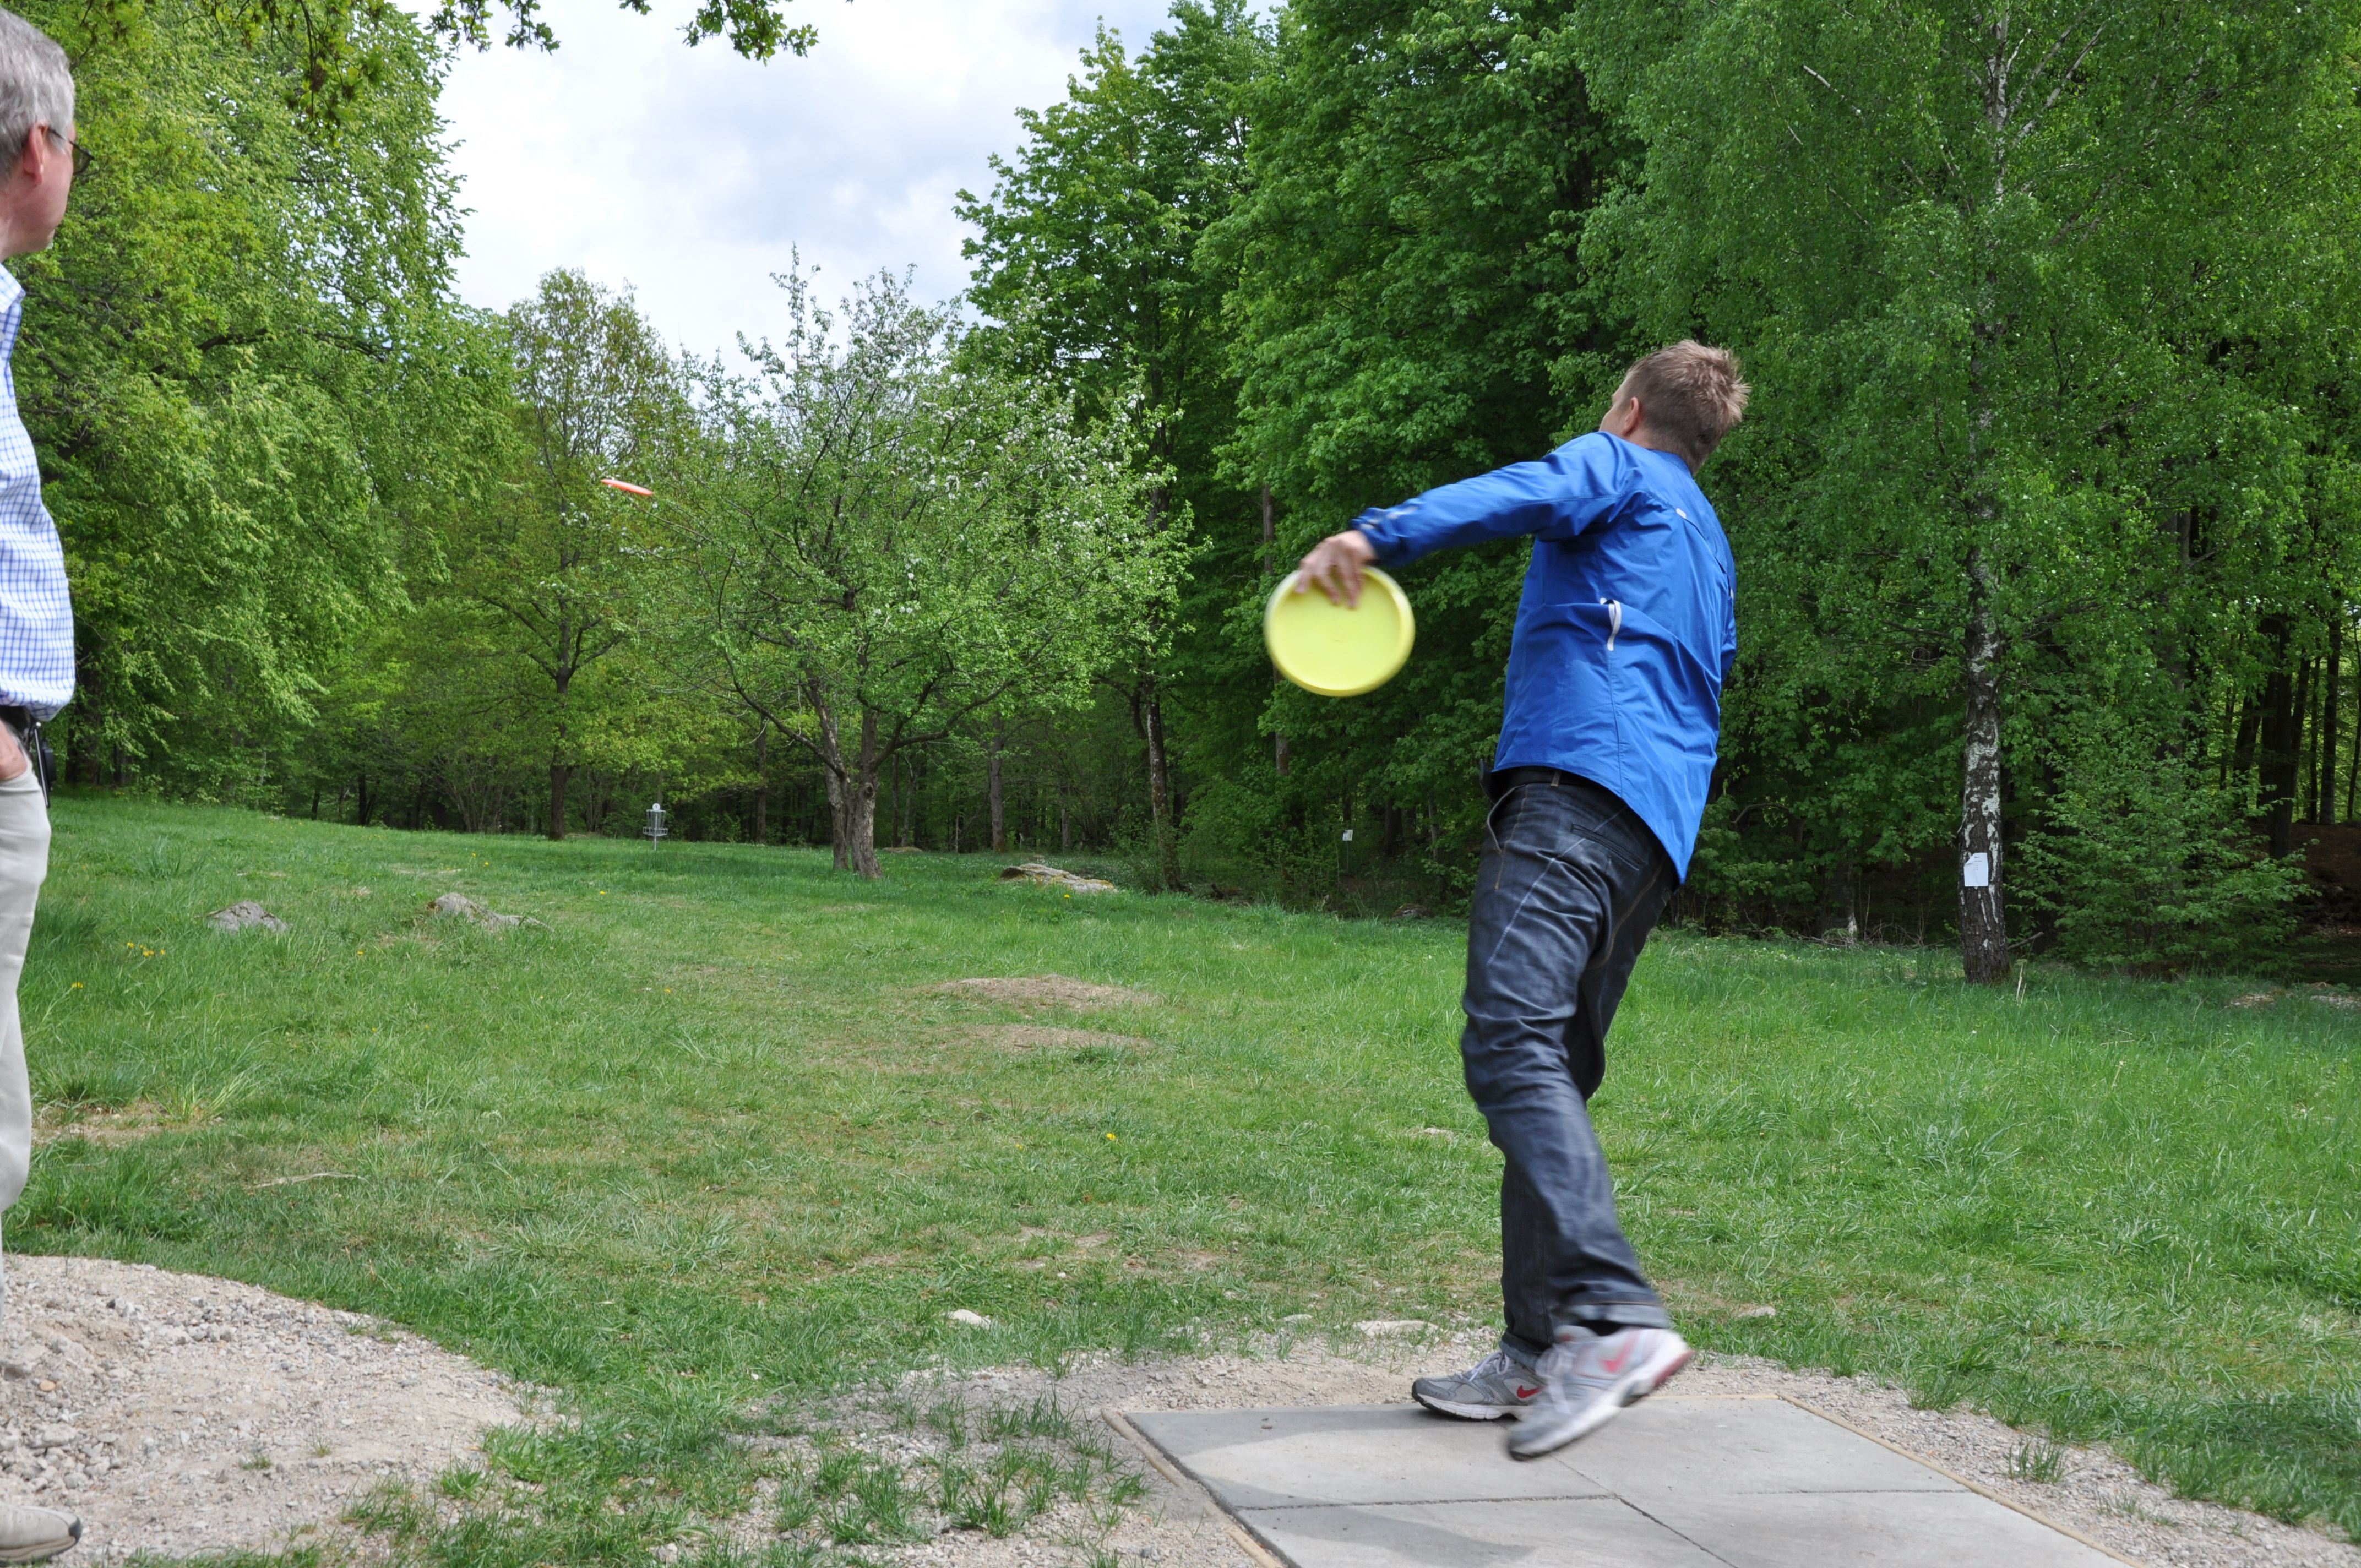 Frisbeegolf/discgolf, Liatorp